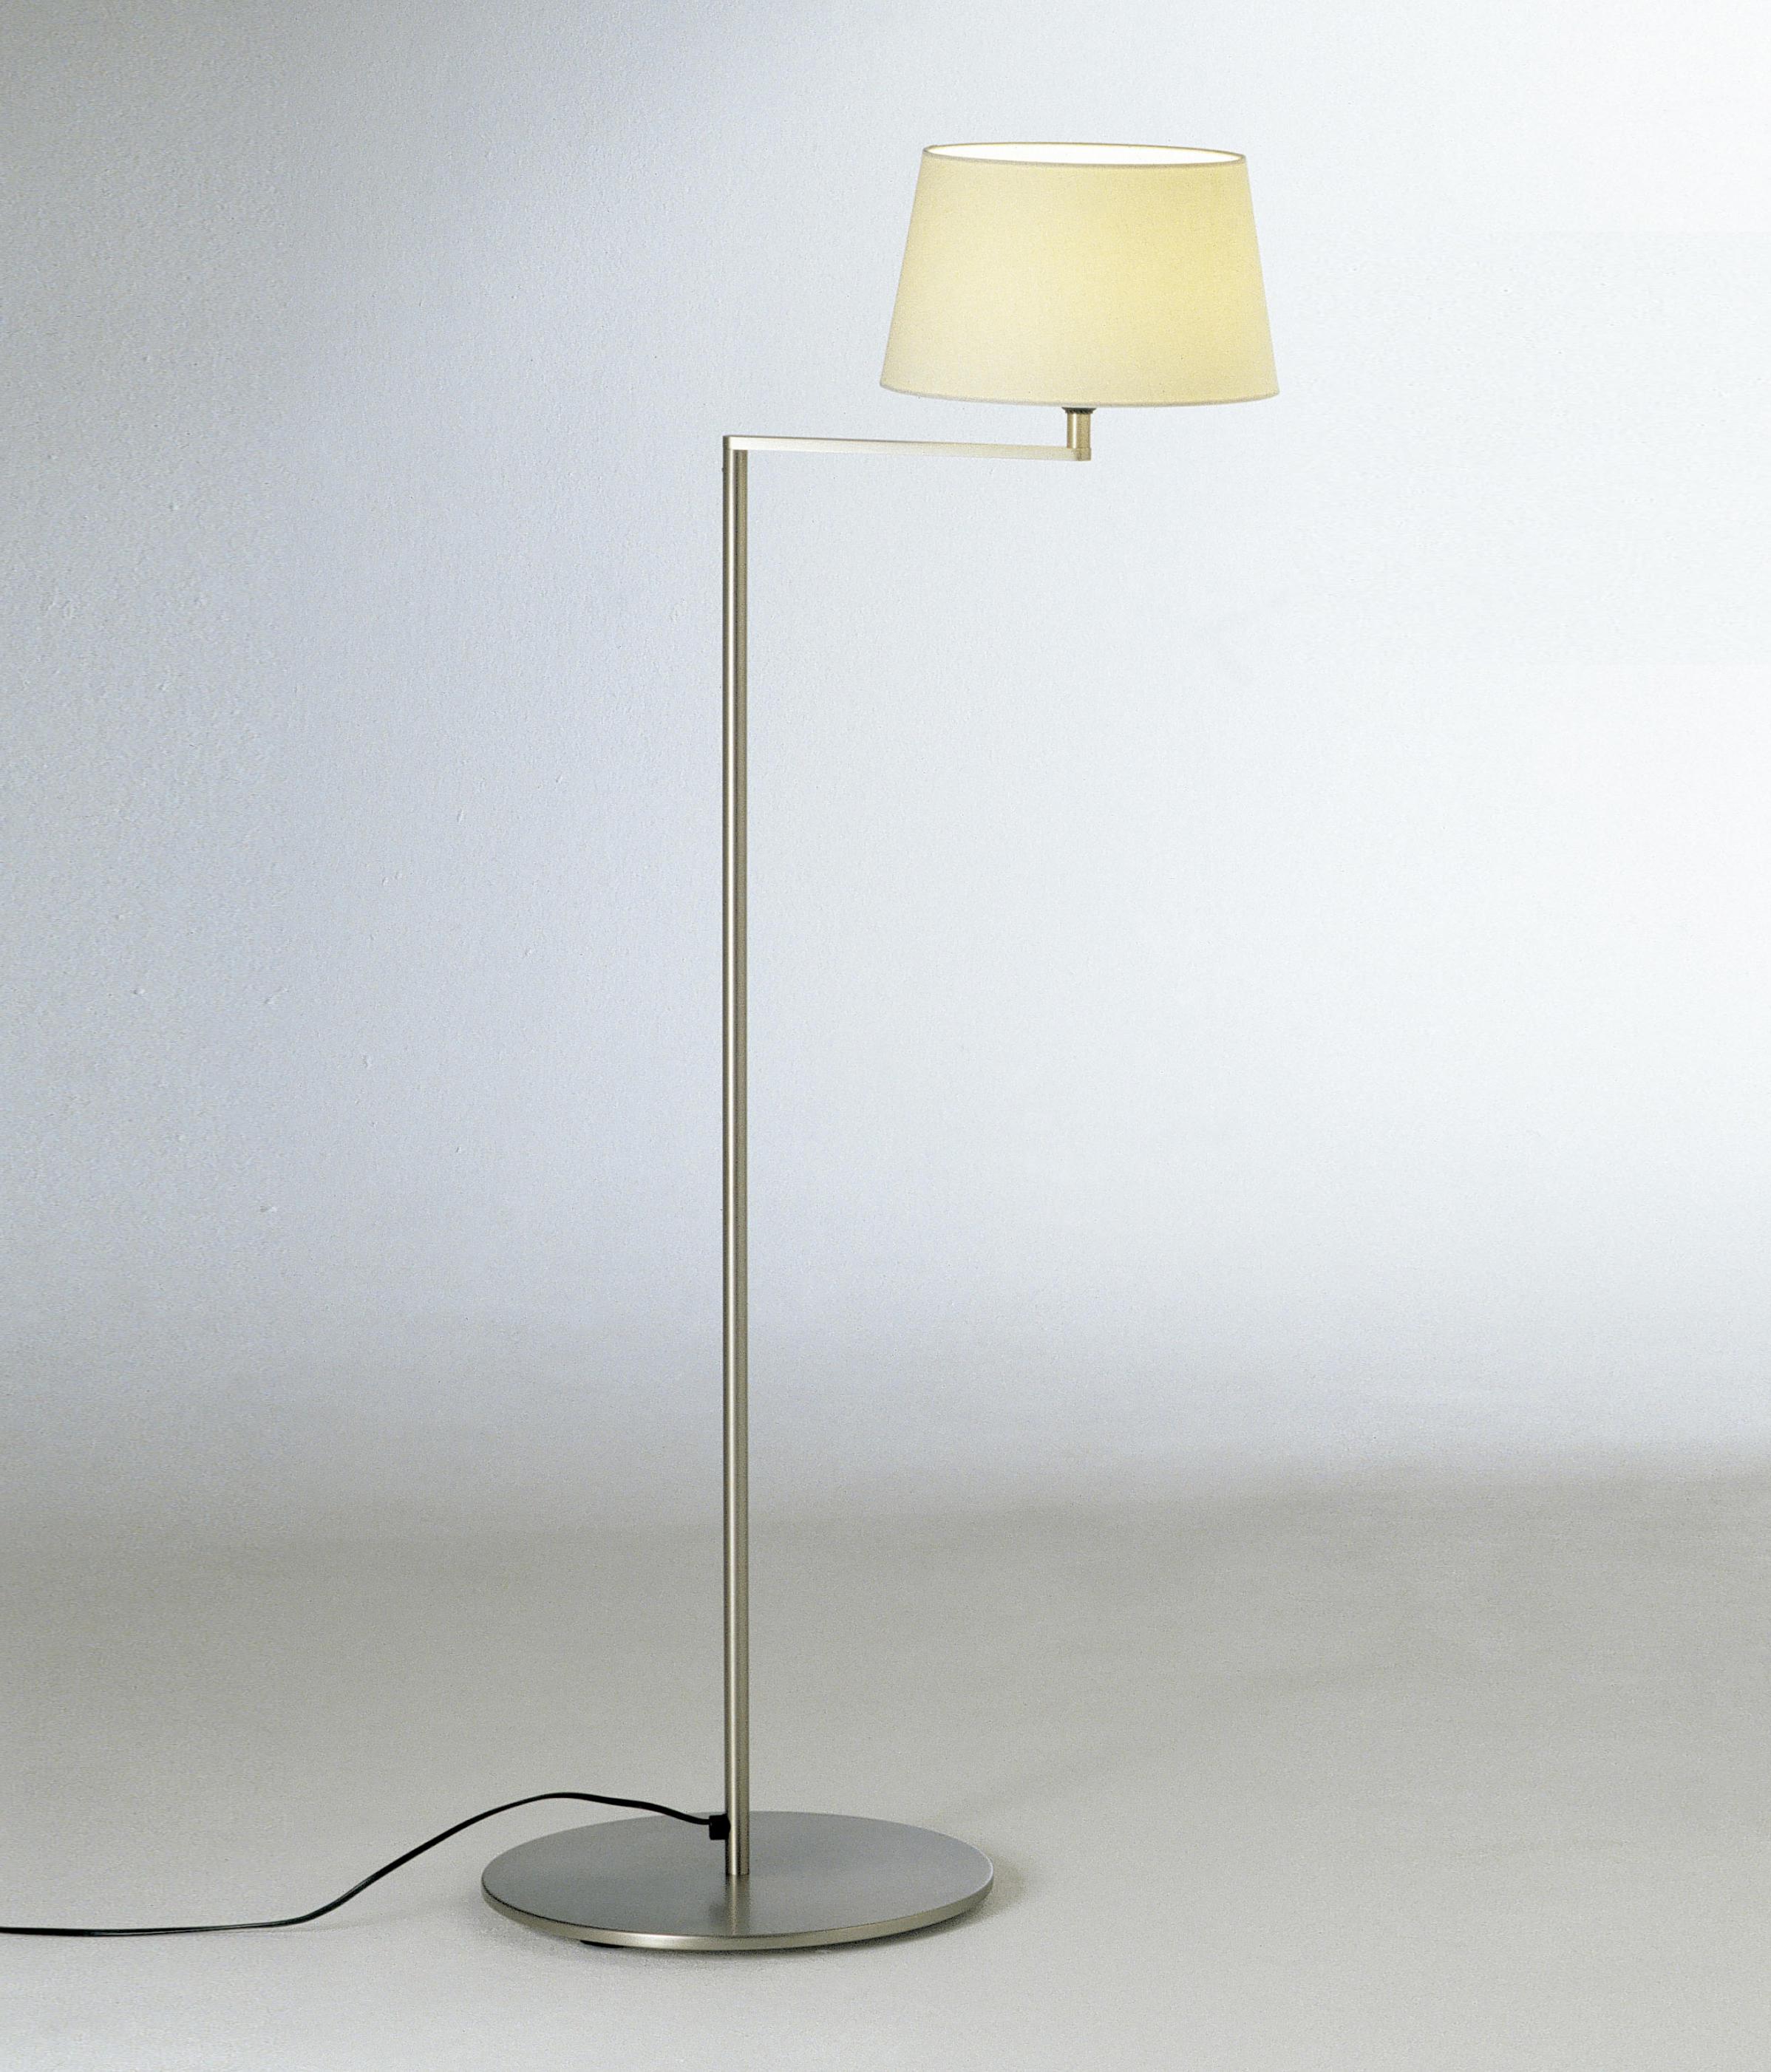 Americana floor lamp iluminaci n general de santa for Distribuidor roca barcelona